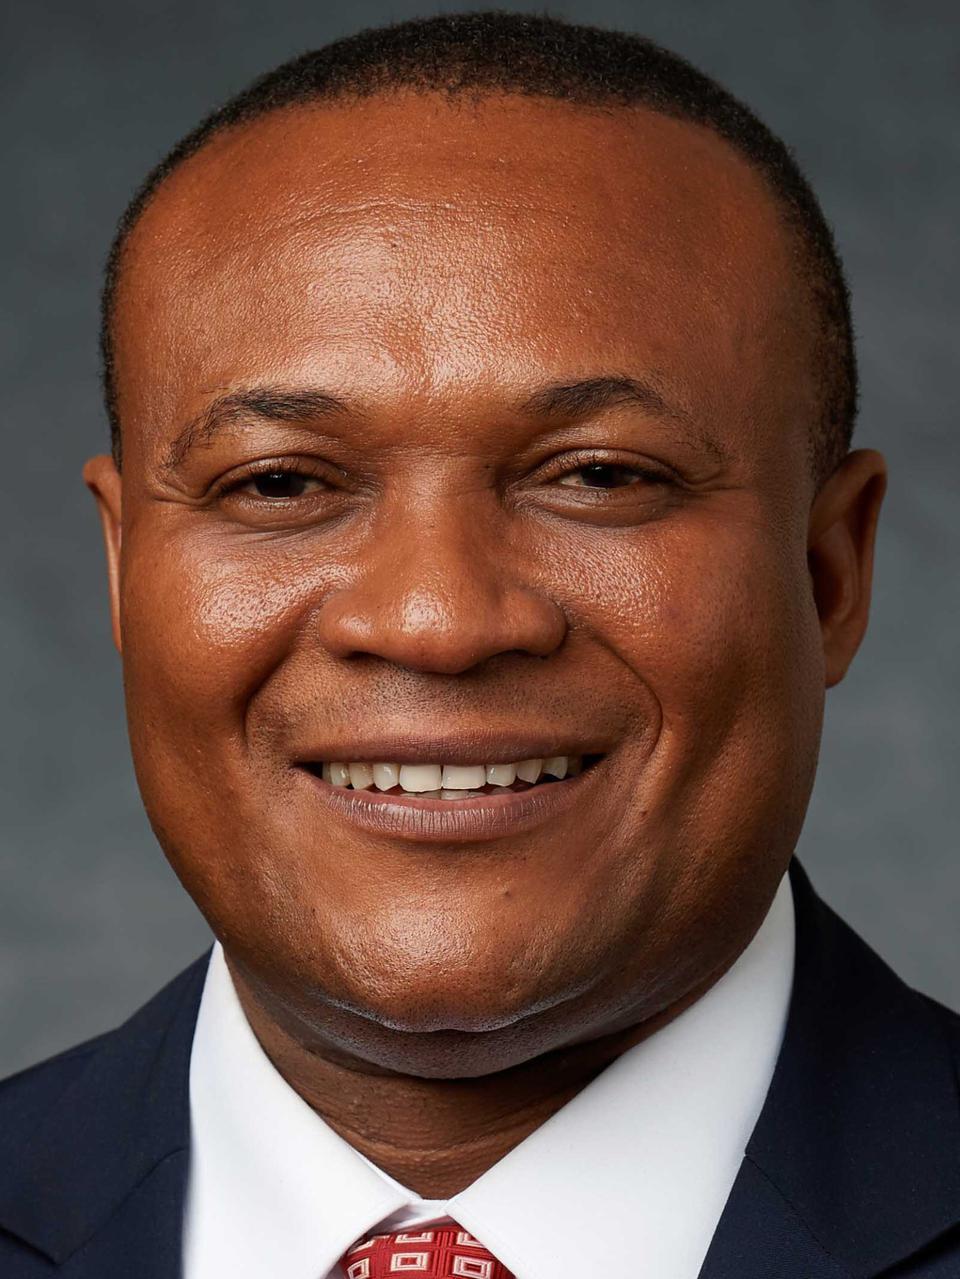 Elder Thierry K. Mutombo